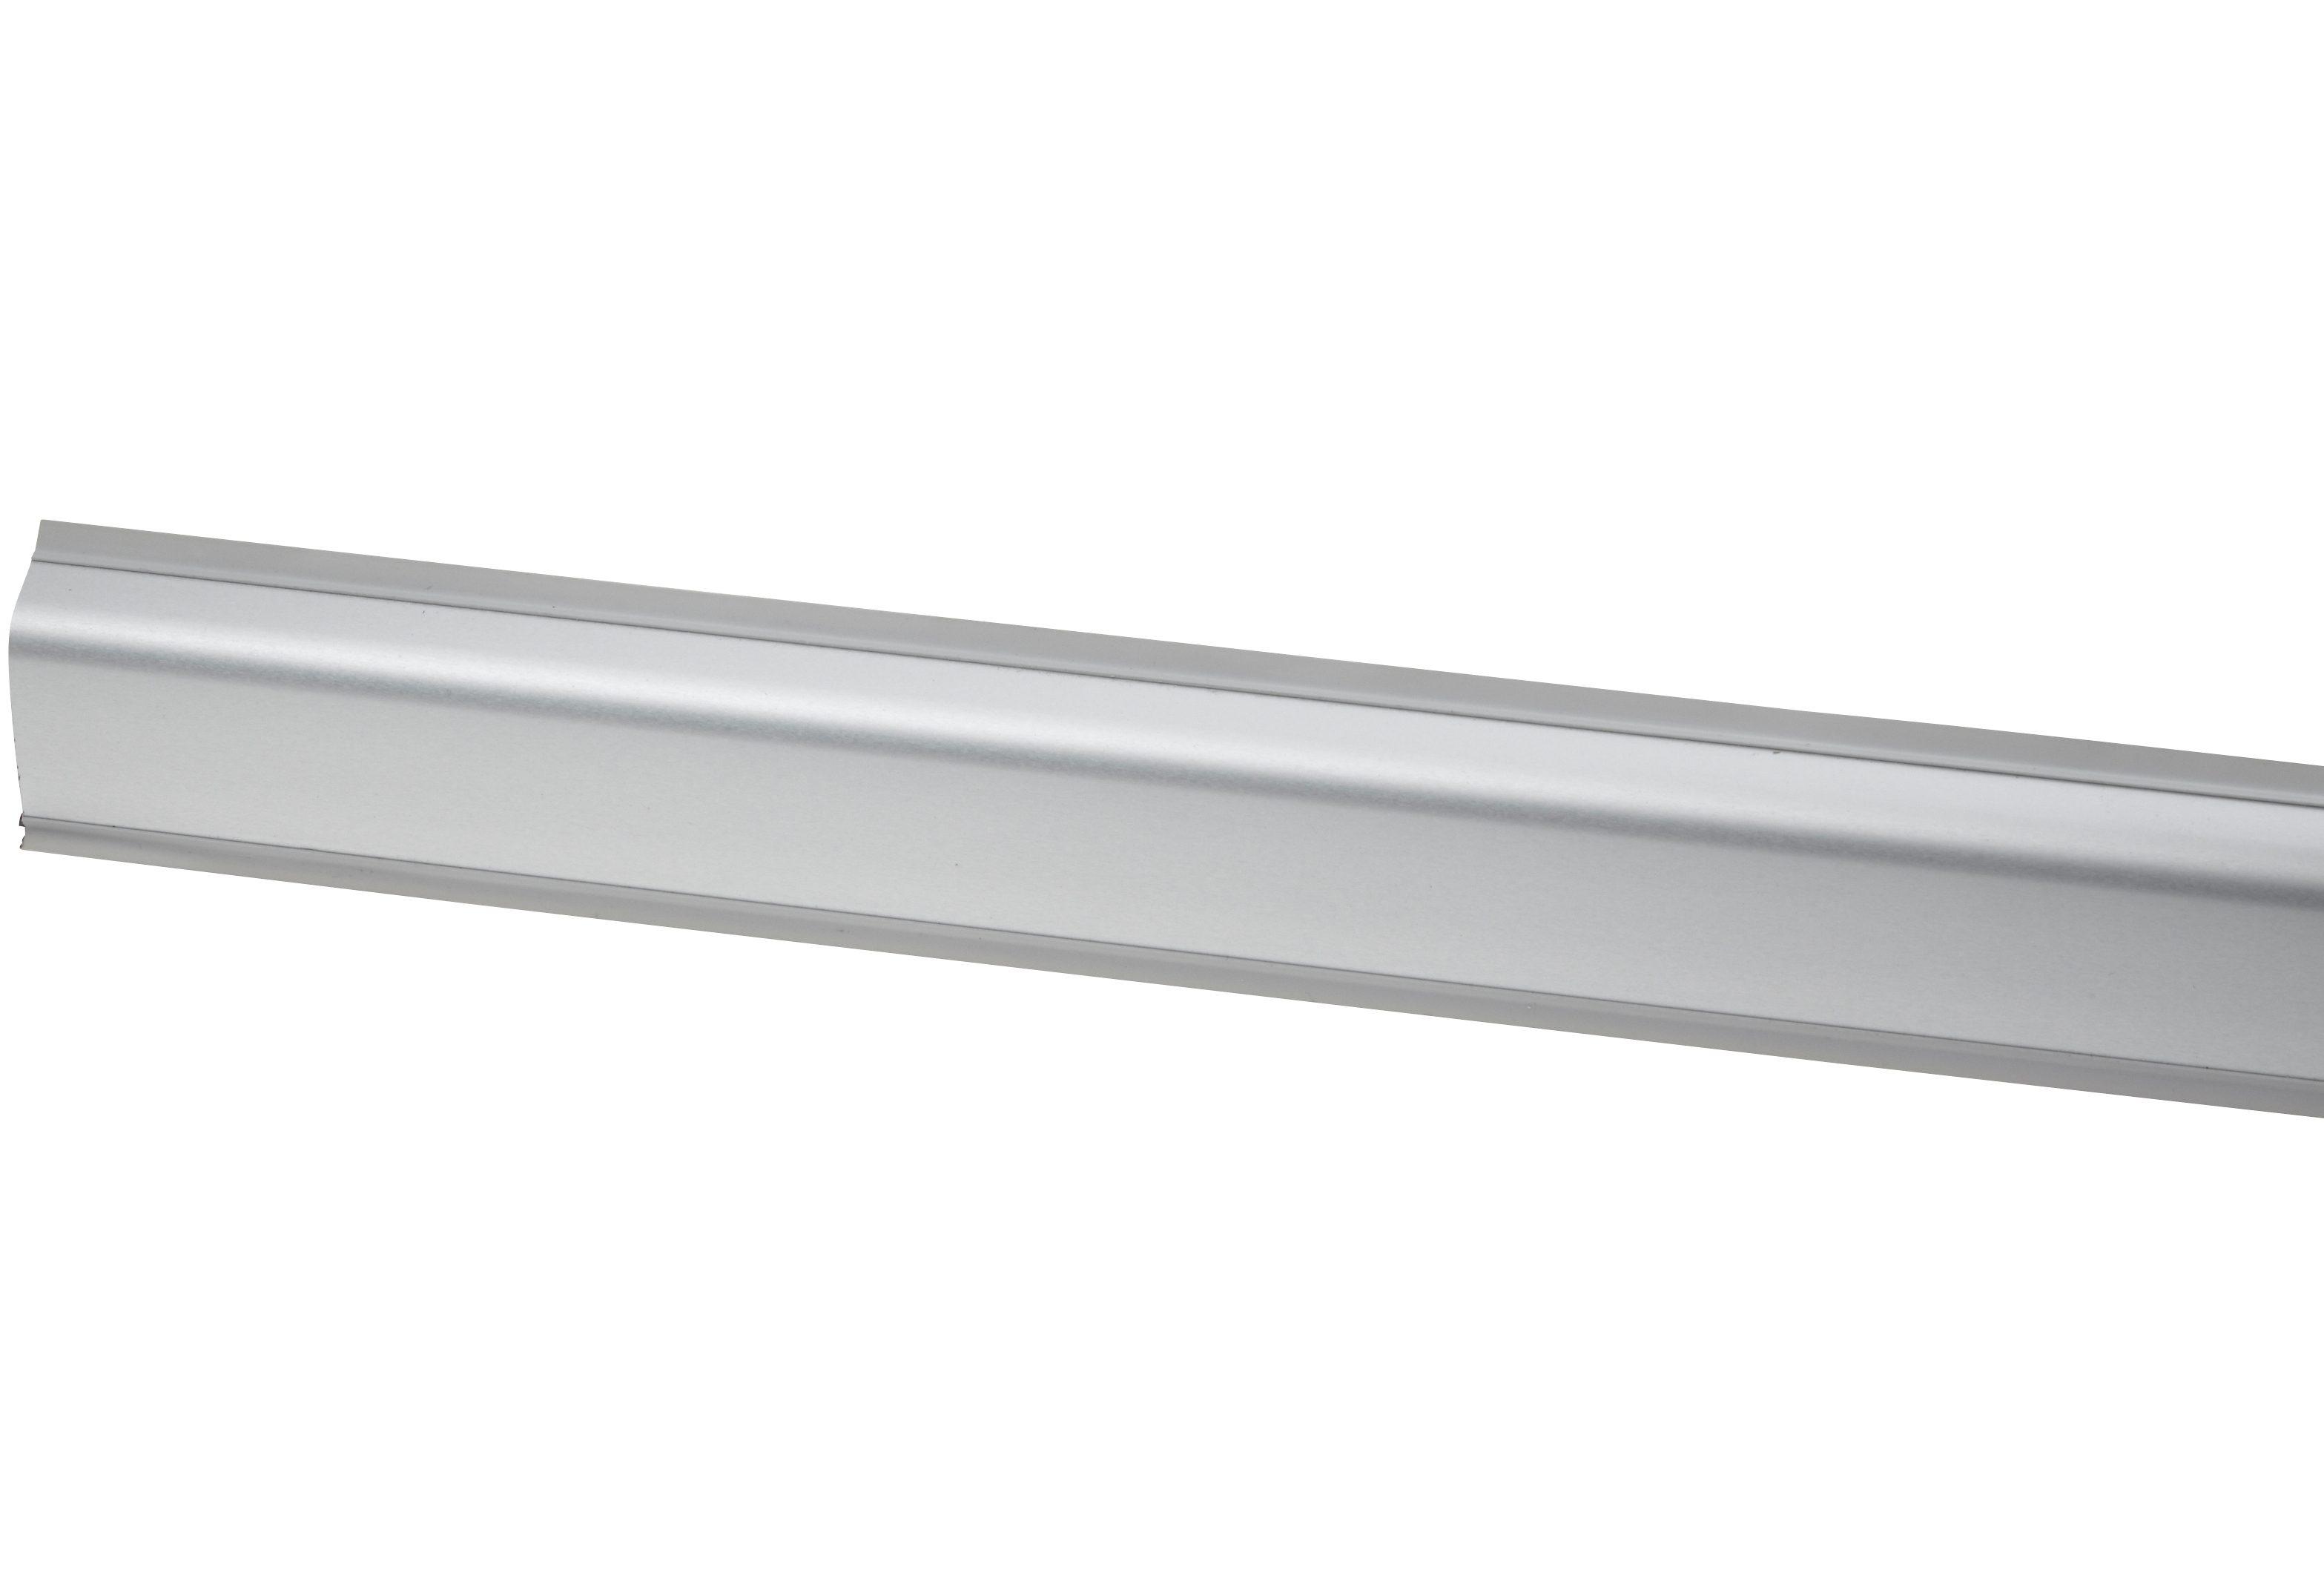 Wandabschlussleiste »Alu«, Länge 5 m (inkl. Eckverbinder und Endkappen)